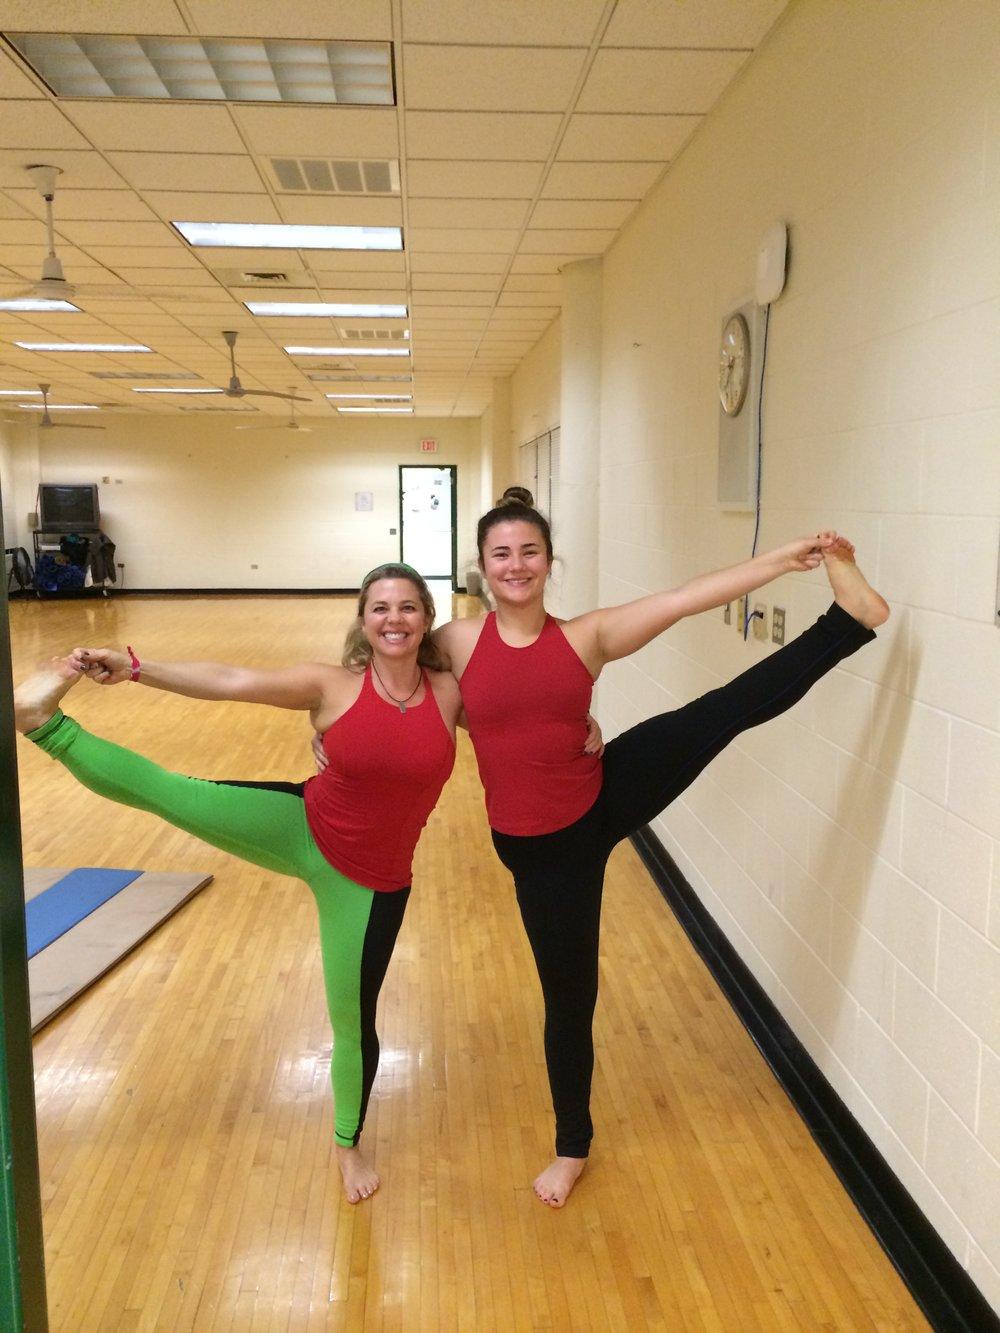 gdub yoga club 1.JPG